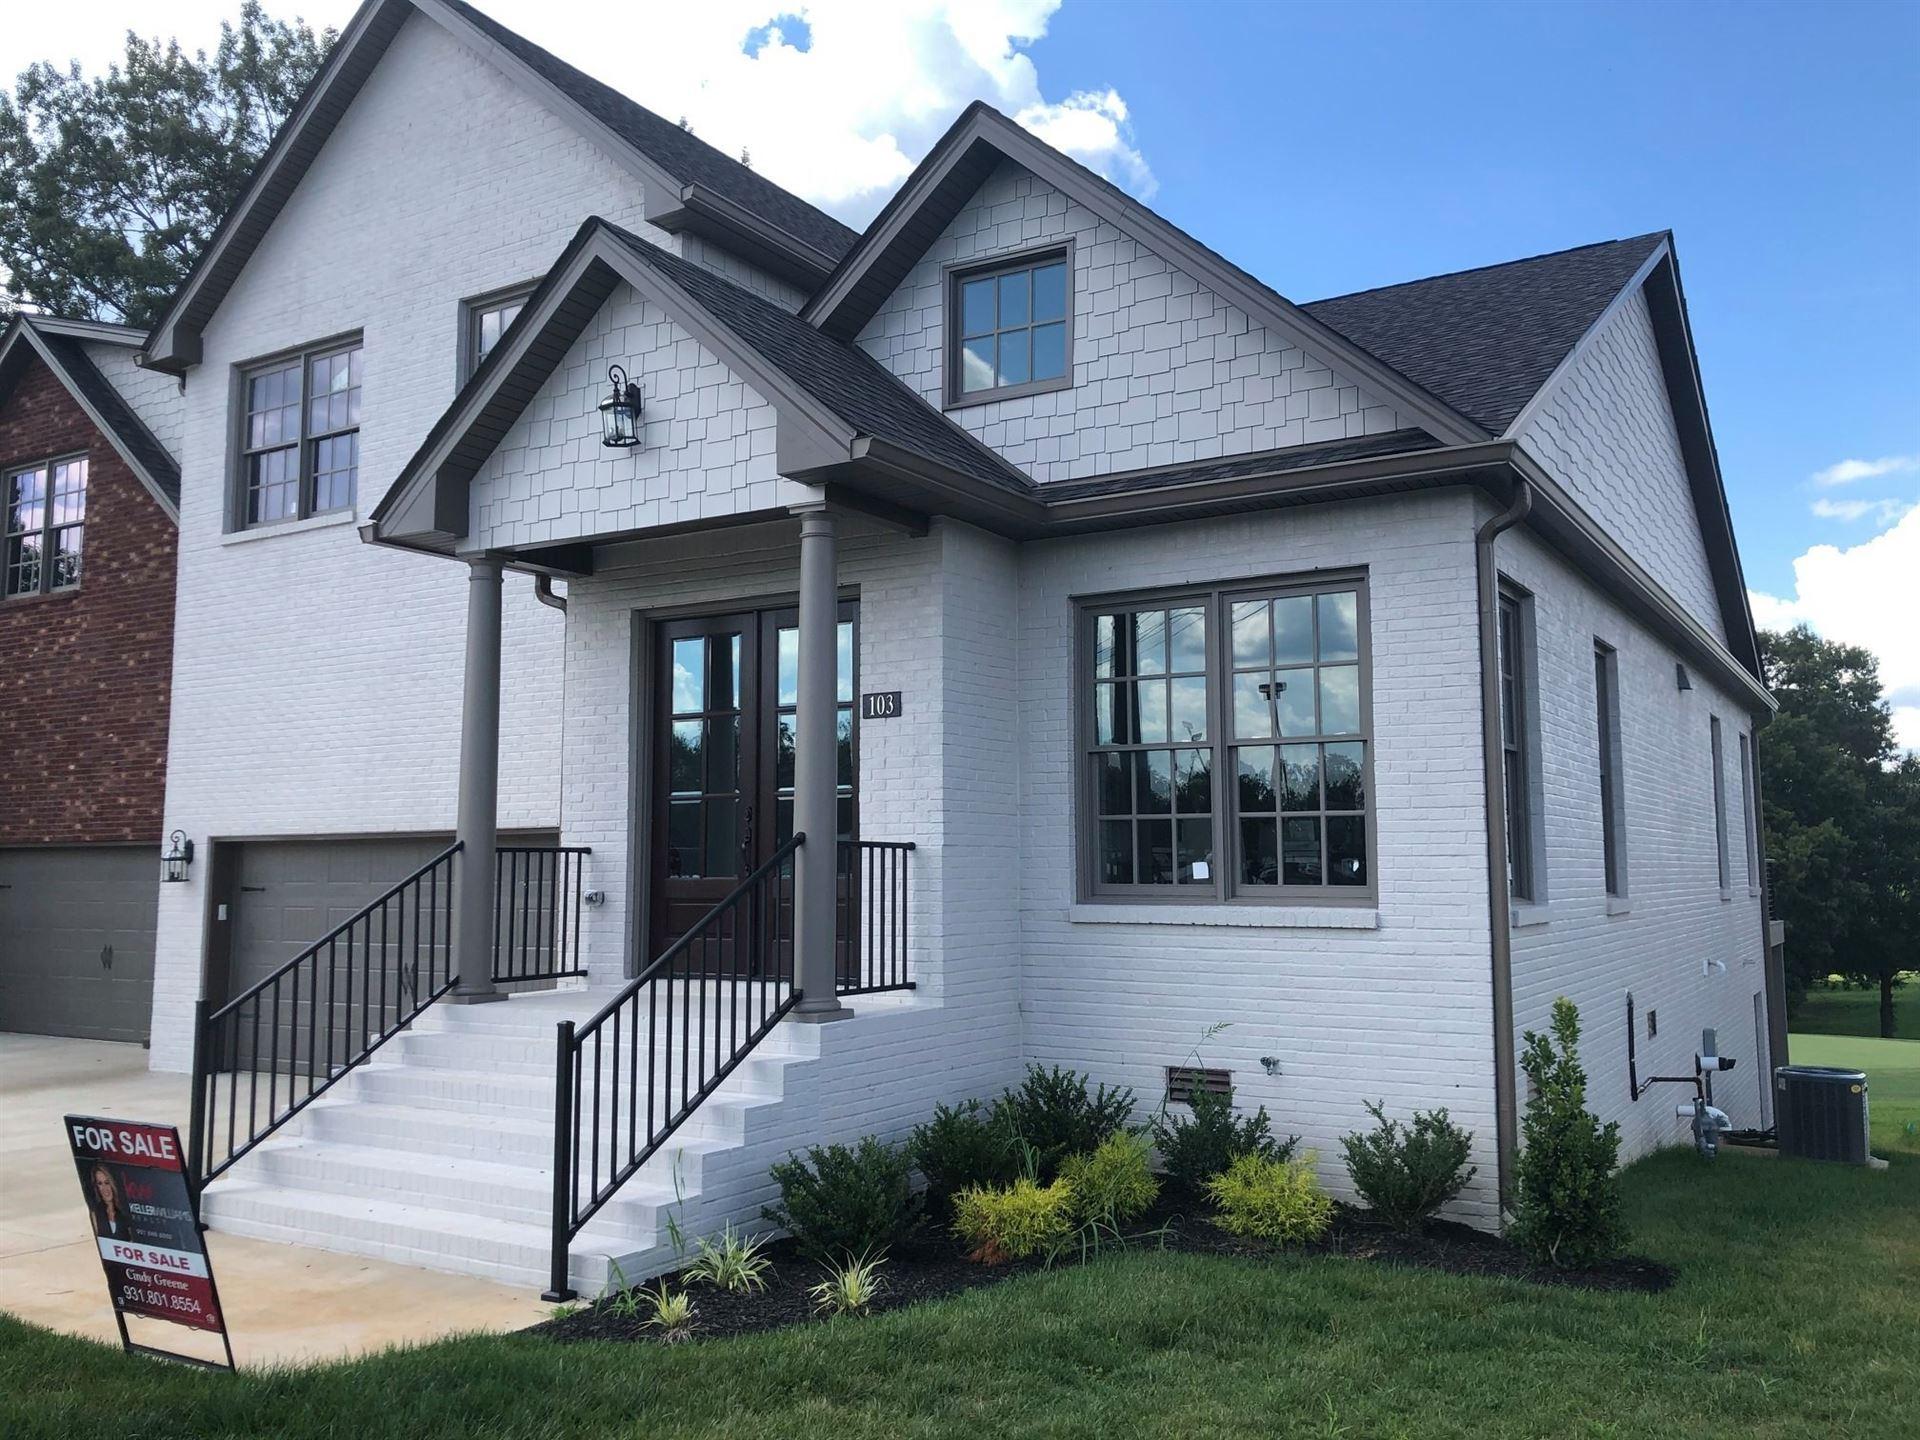 334 Fairway Drive #103, Clarksville, TN 37043 - MLS#: 2130833